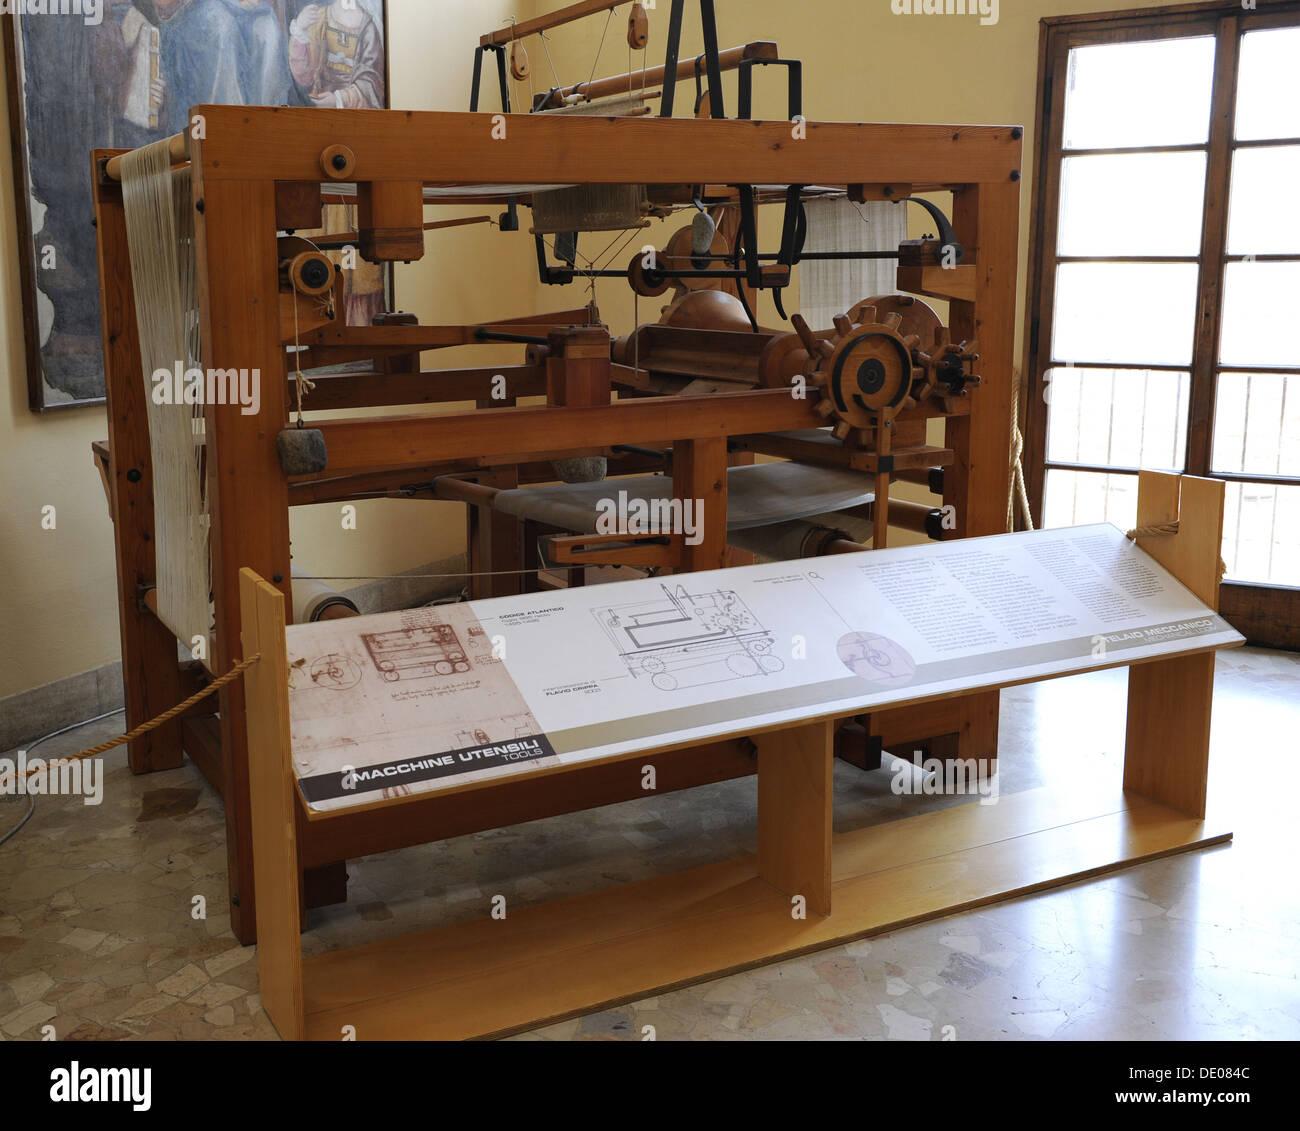 Studio Di Leonardo Da Vinci Macchine Di Tessitura Telaio